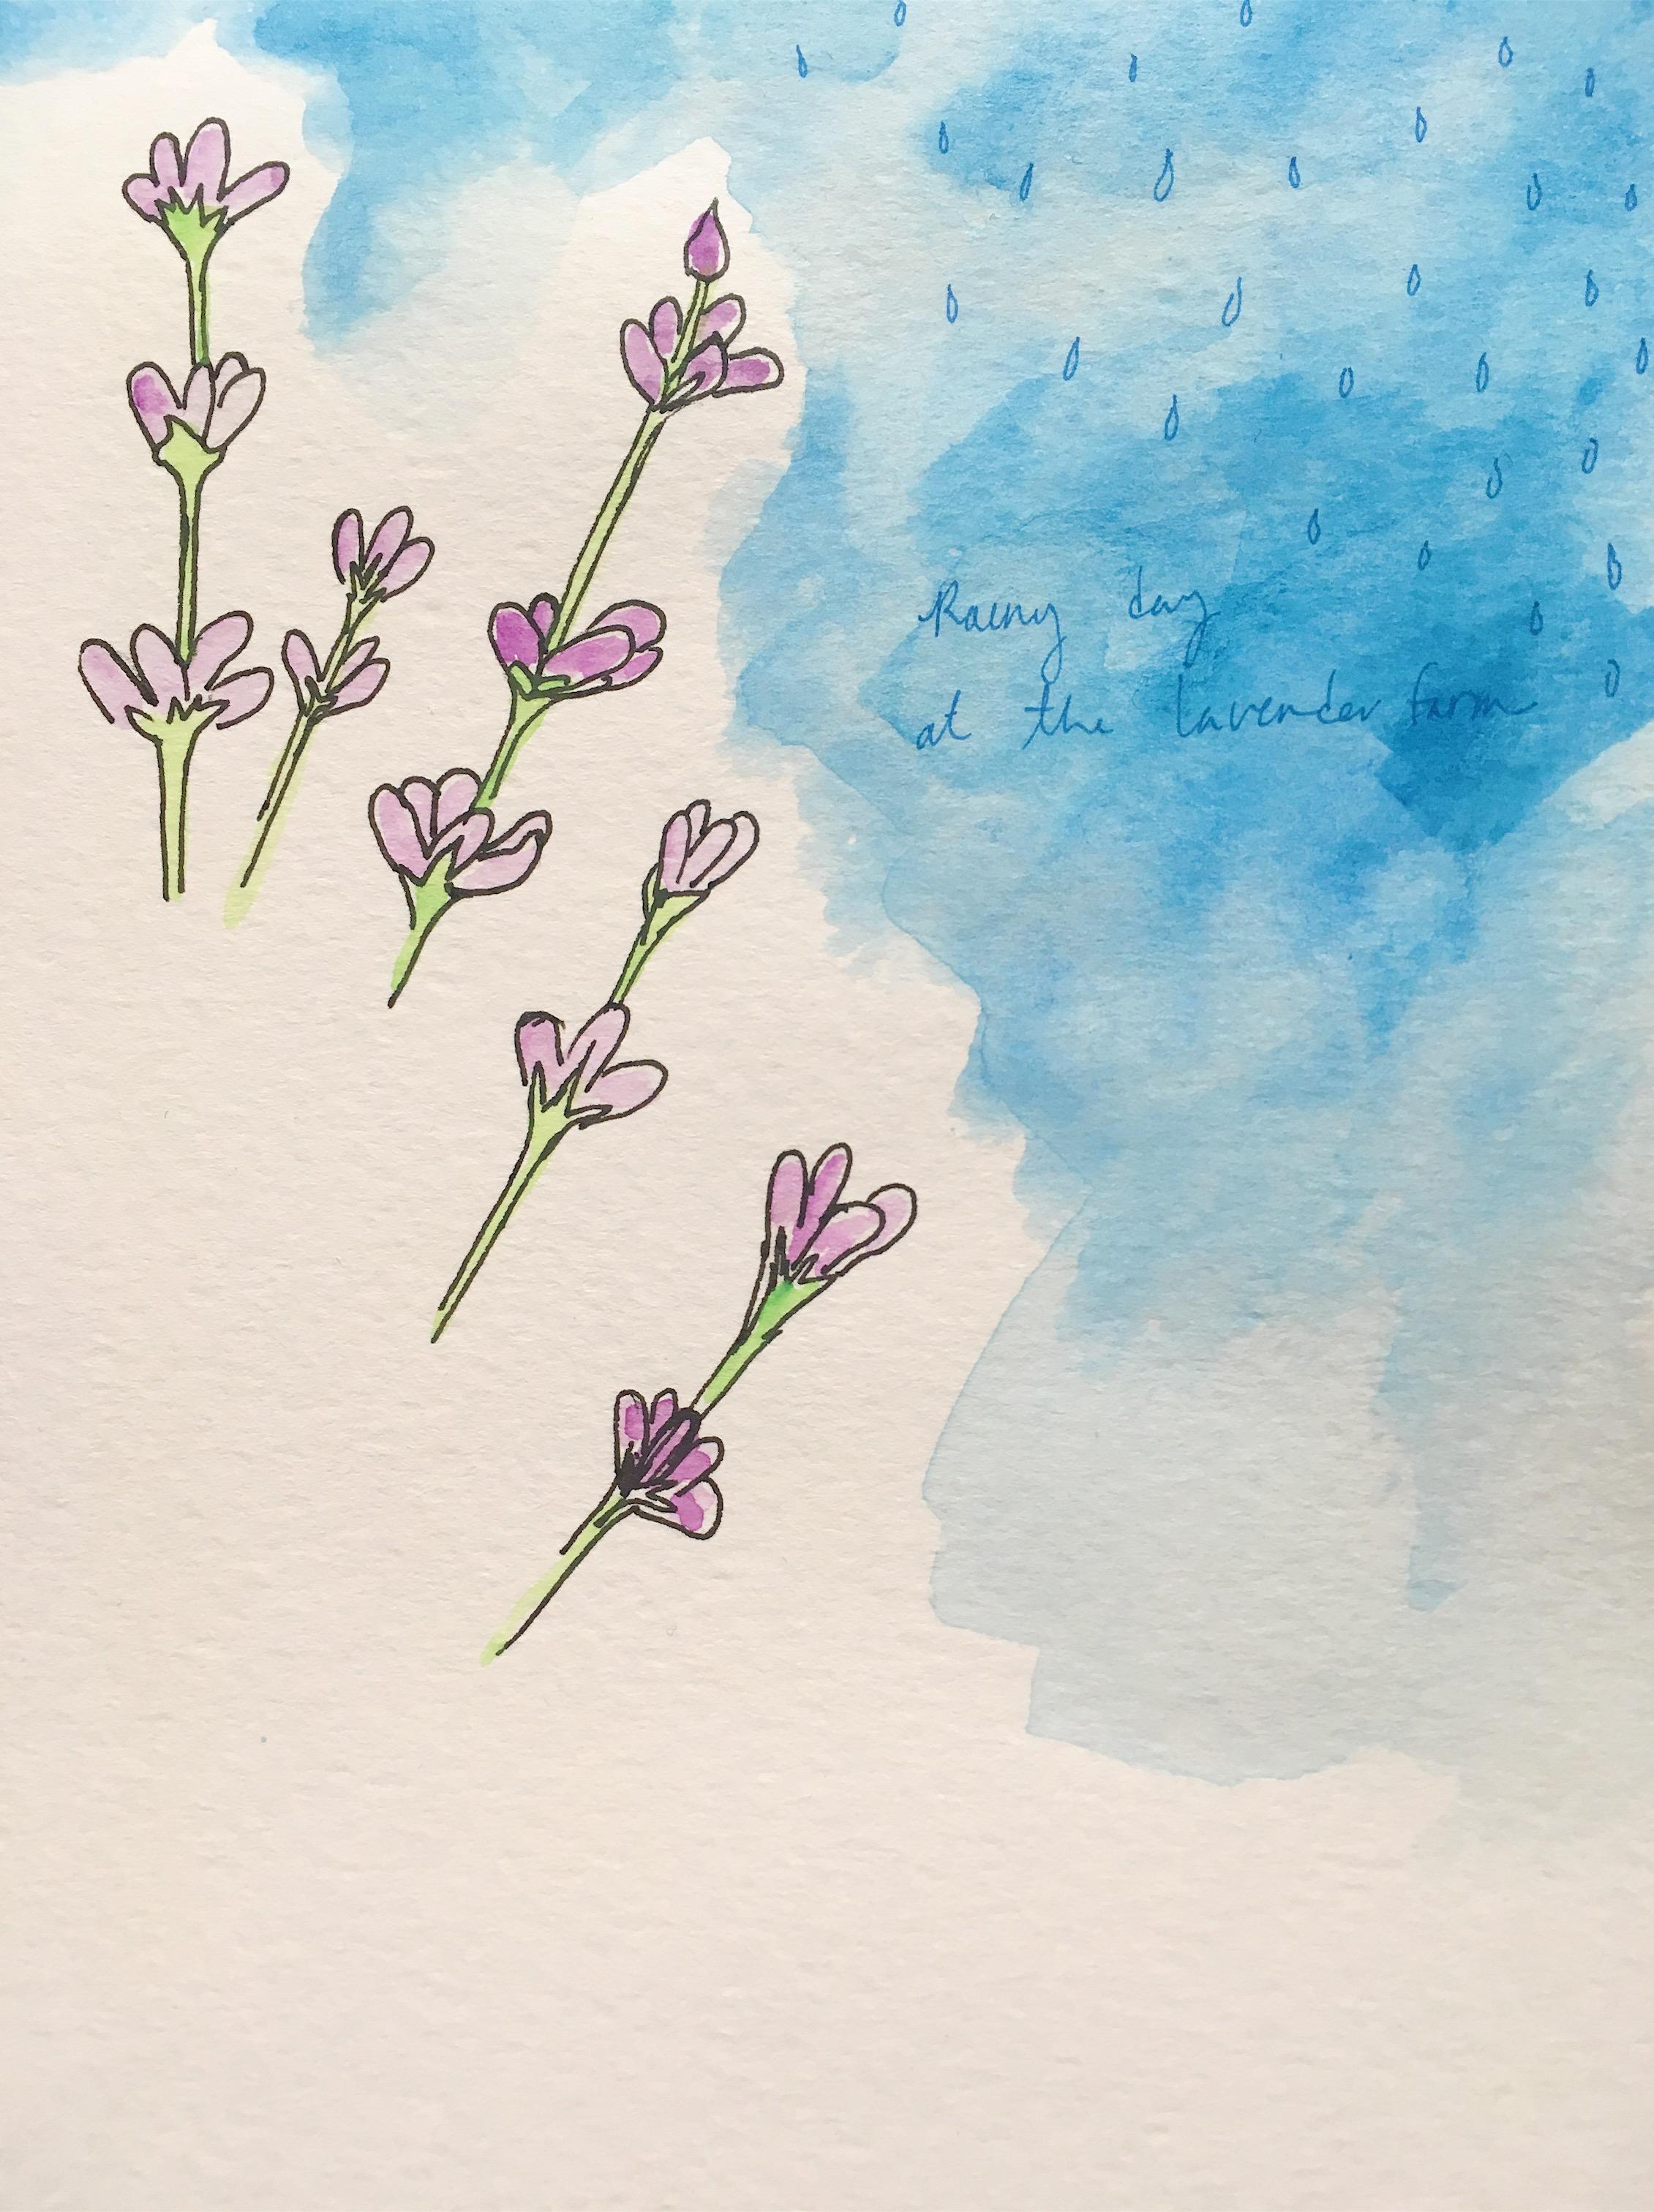 rain day at the lavender farm